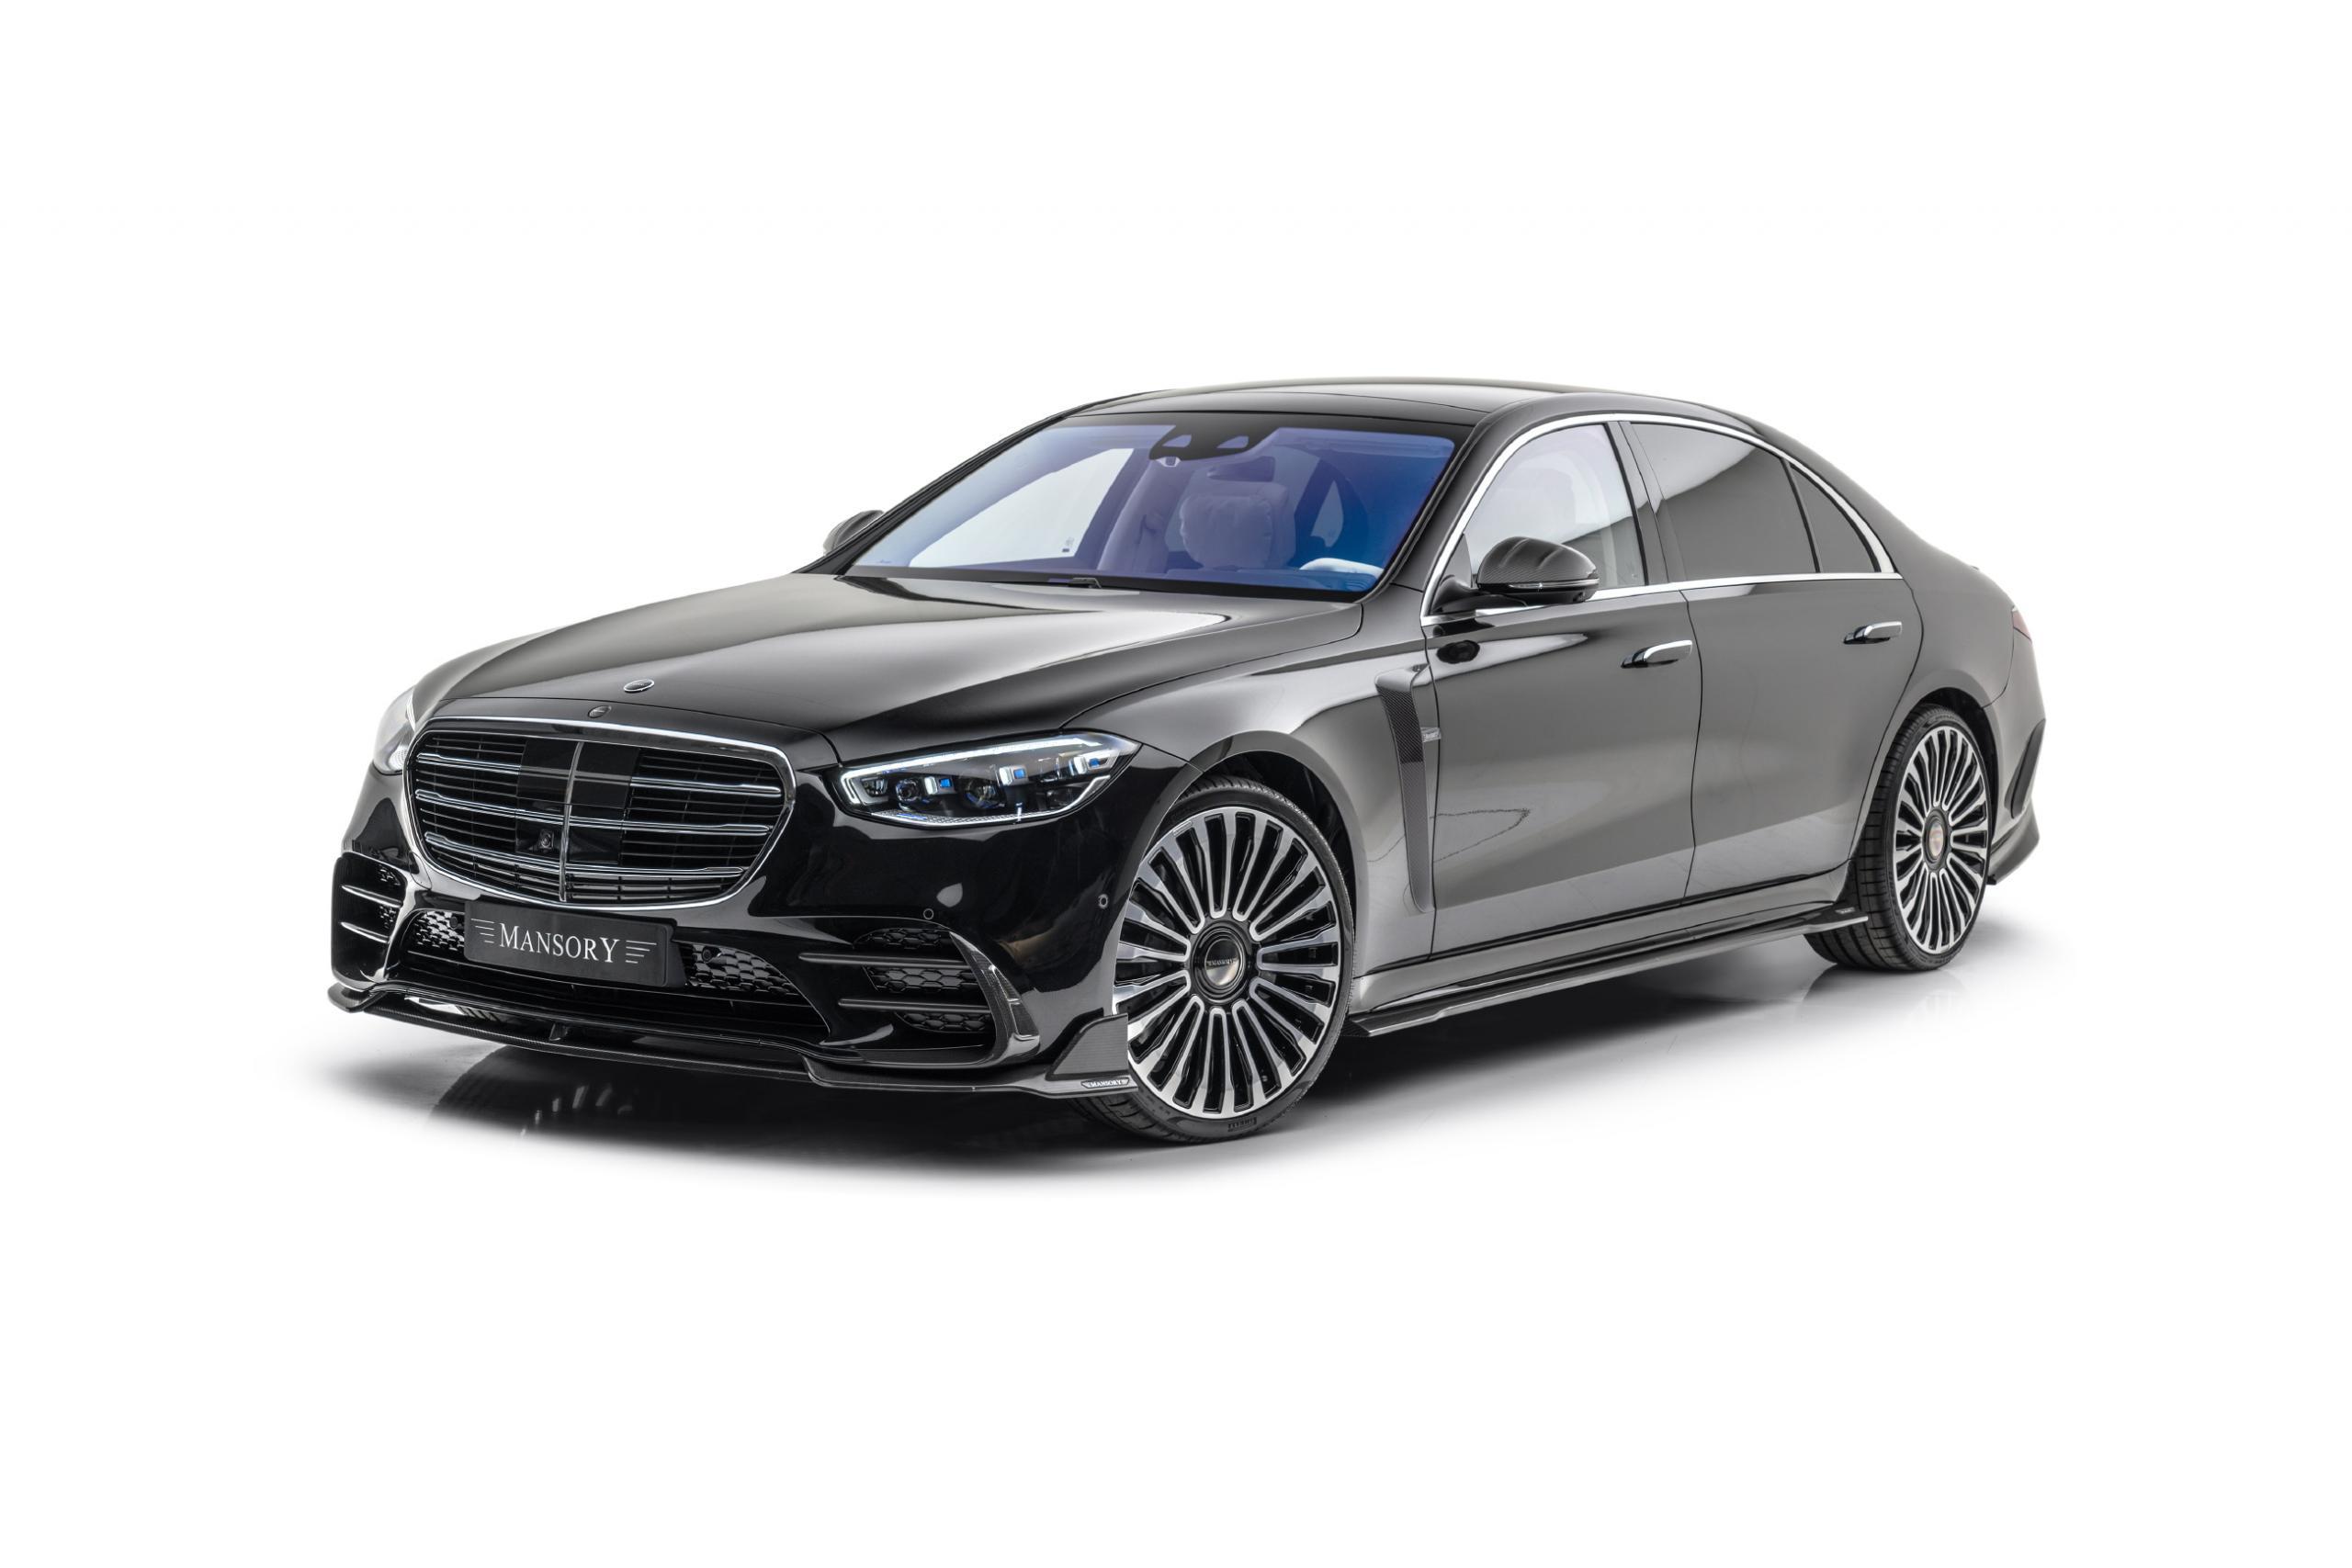 mansory w223 mercedes s class body kit carbon fiber front lip air intake fender mirror cover side skirt set cs11 22 wheel 2021 2022 2023